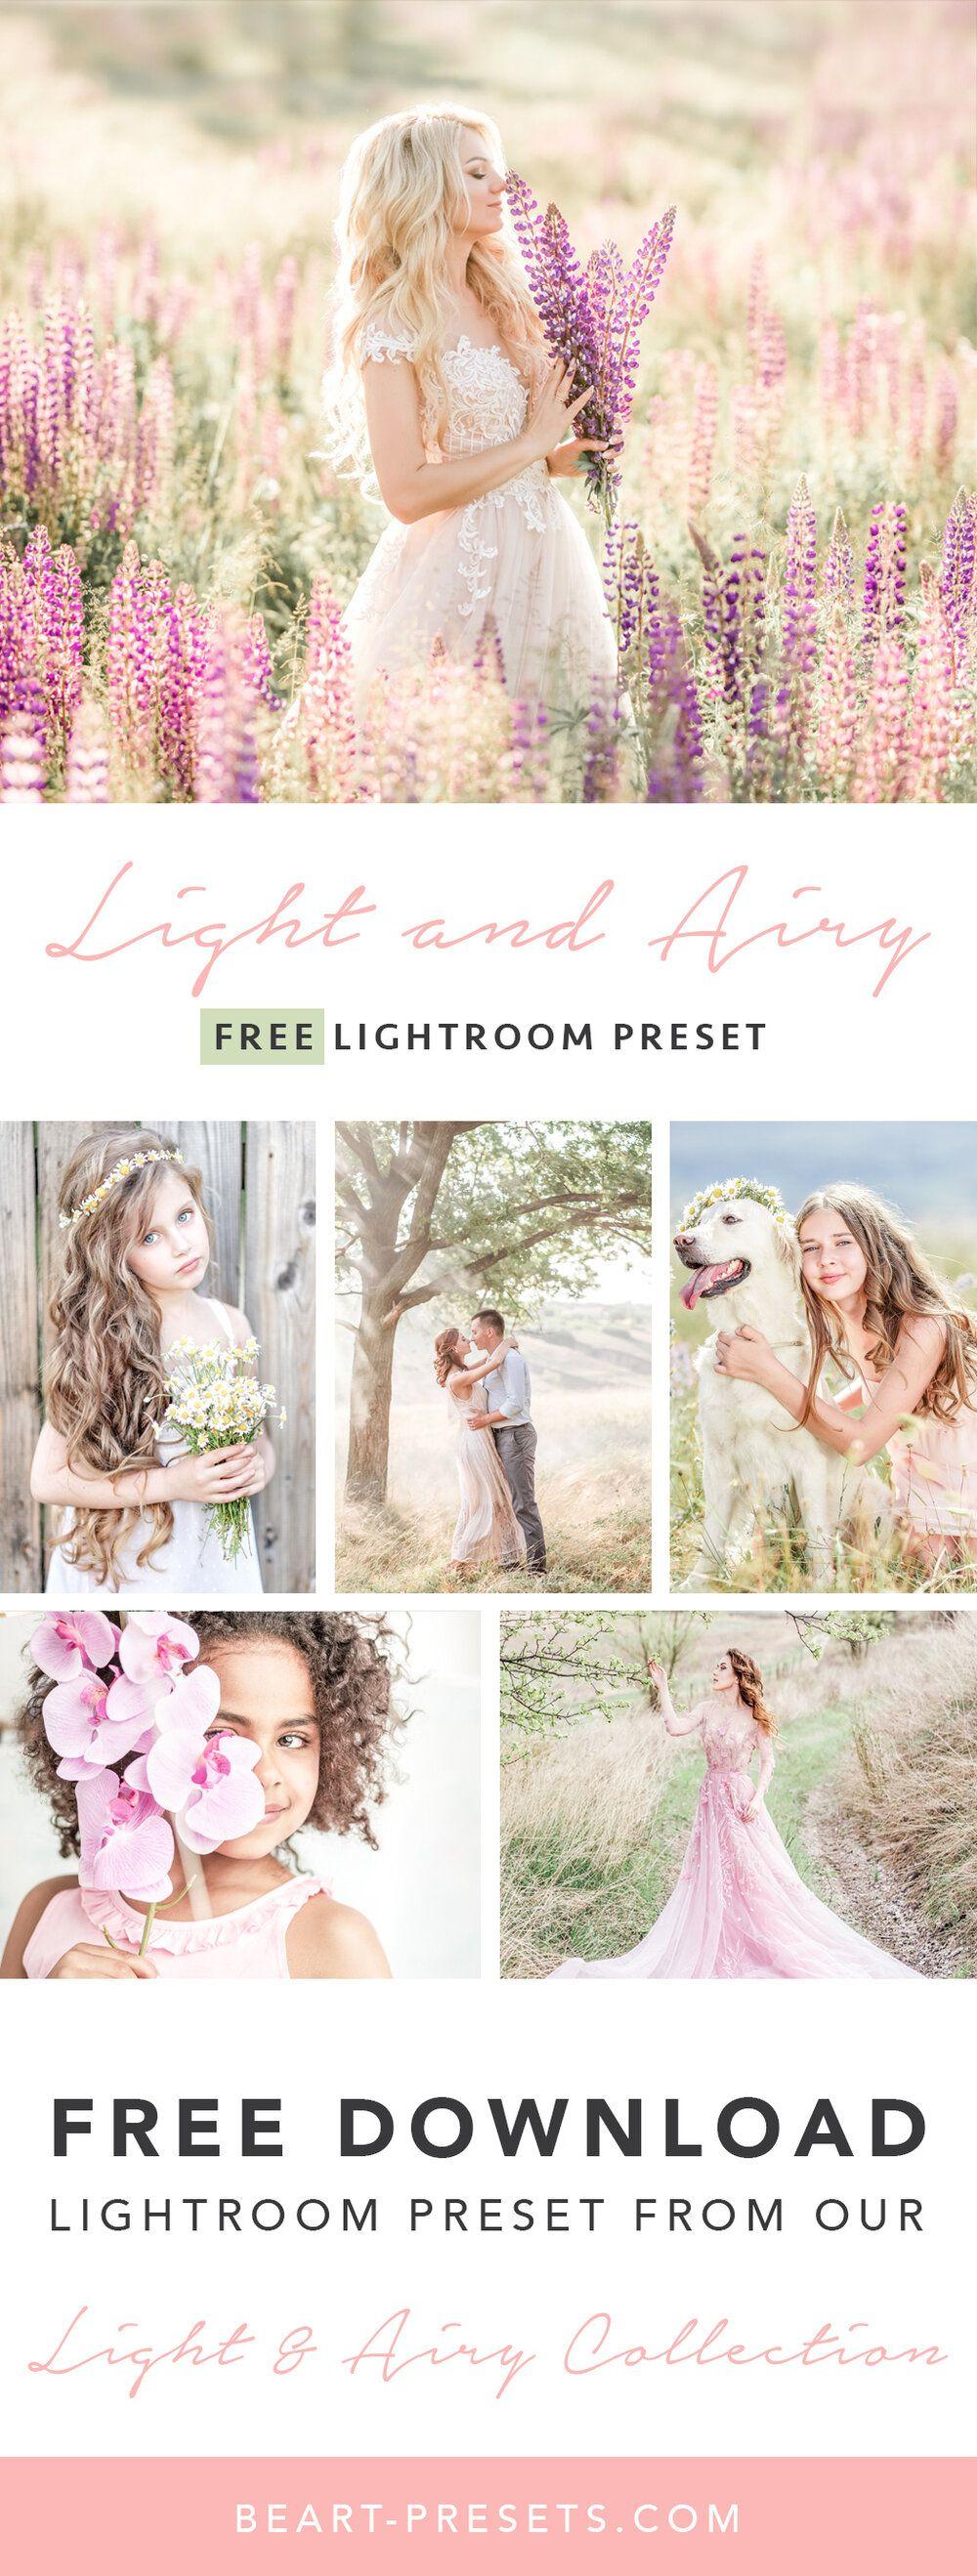 Free Light & Airy Lightroom Preset in 2020 Best free